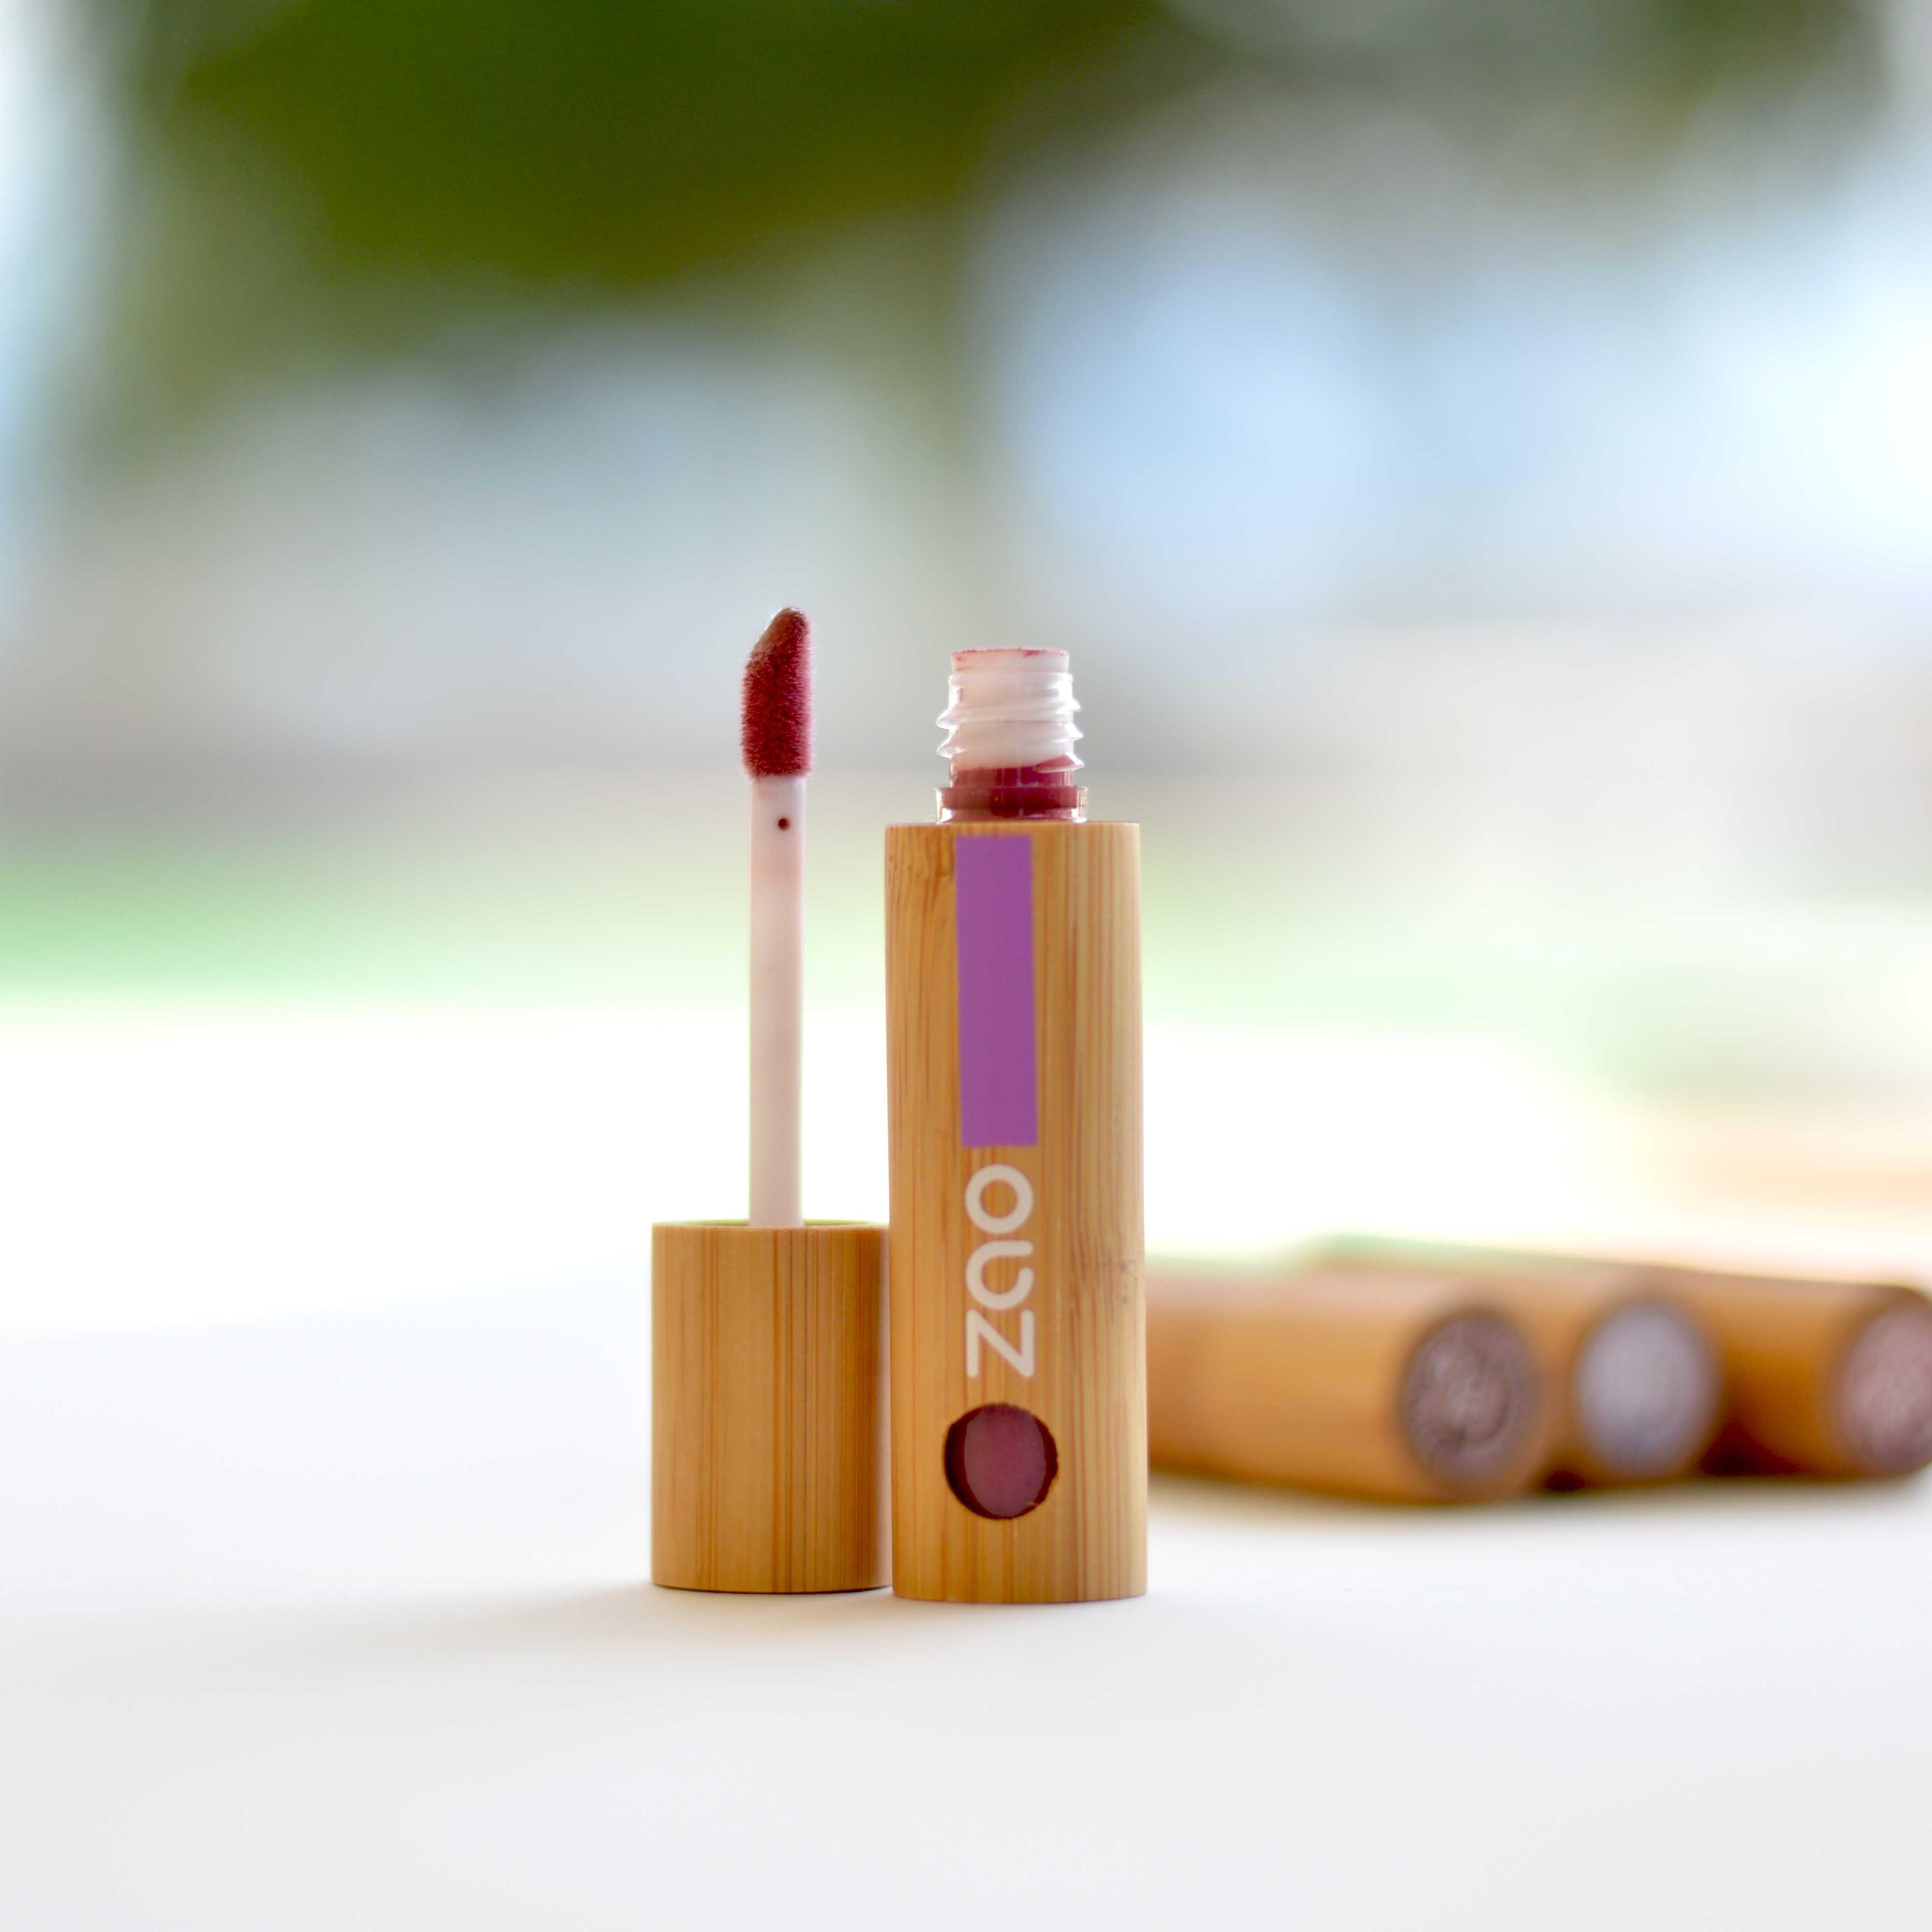 Vernis à lèvres bio, 100 naturel et vegan Salud